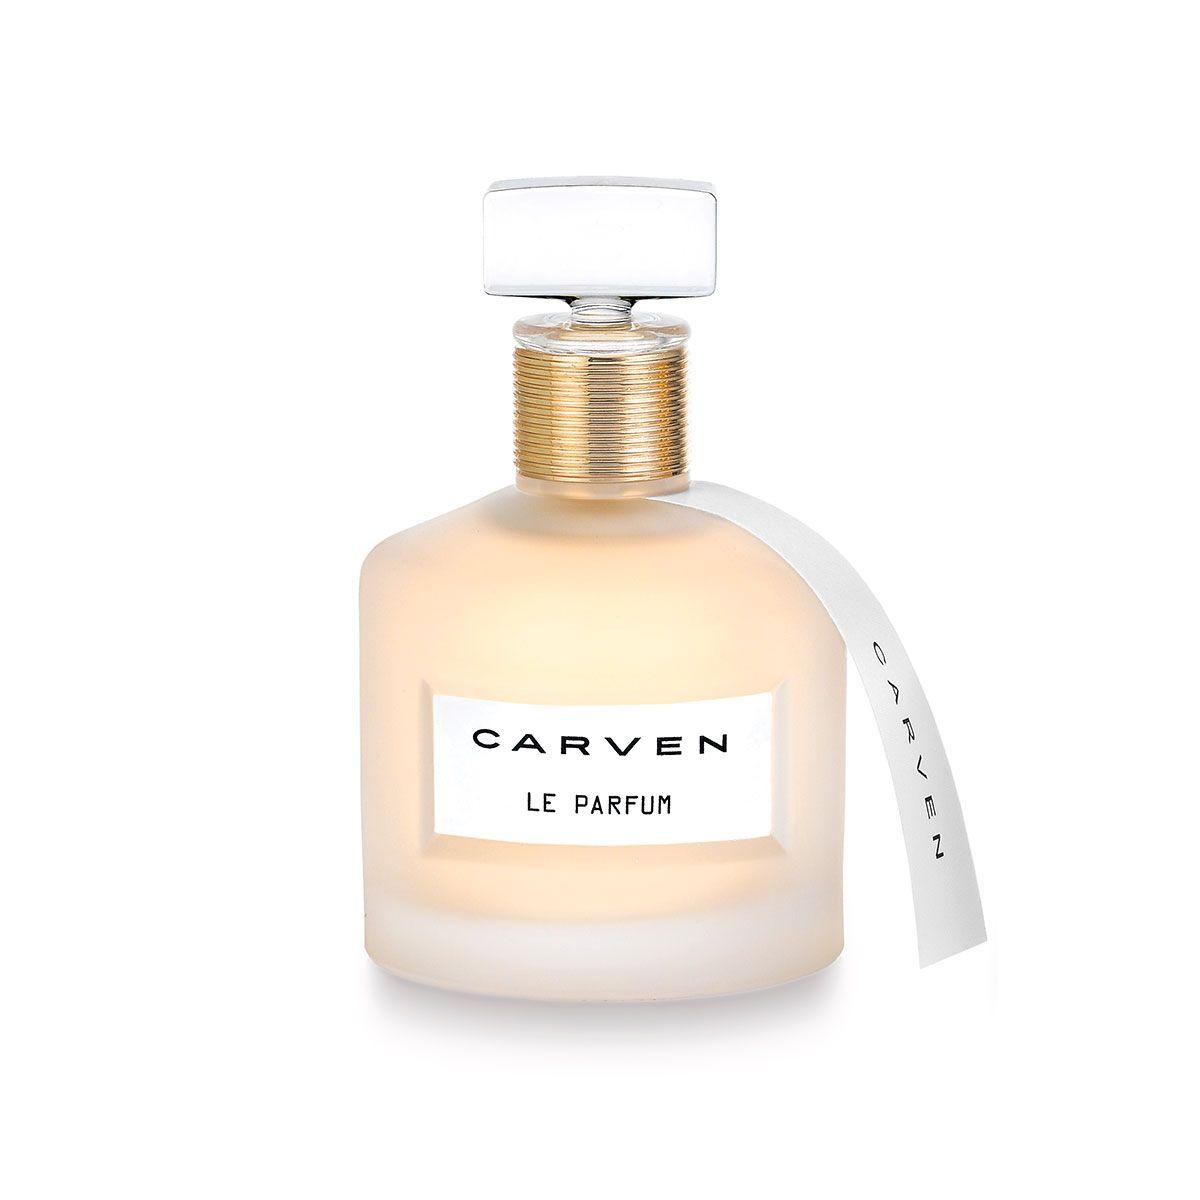 fdc899c5154 Top Internacional - Perfume Feminino Carven Carven Le Parfum Eau de Parfum  EDP 50 ml 33816